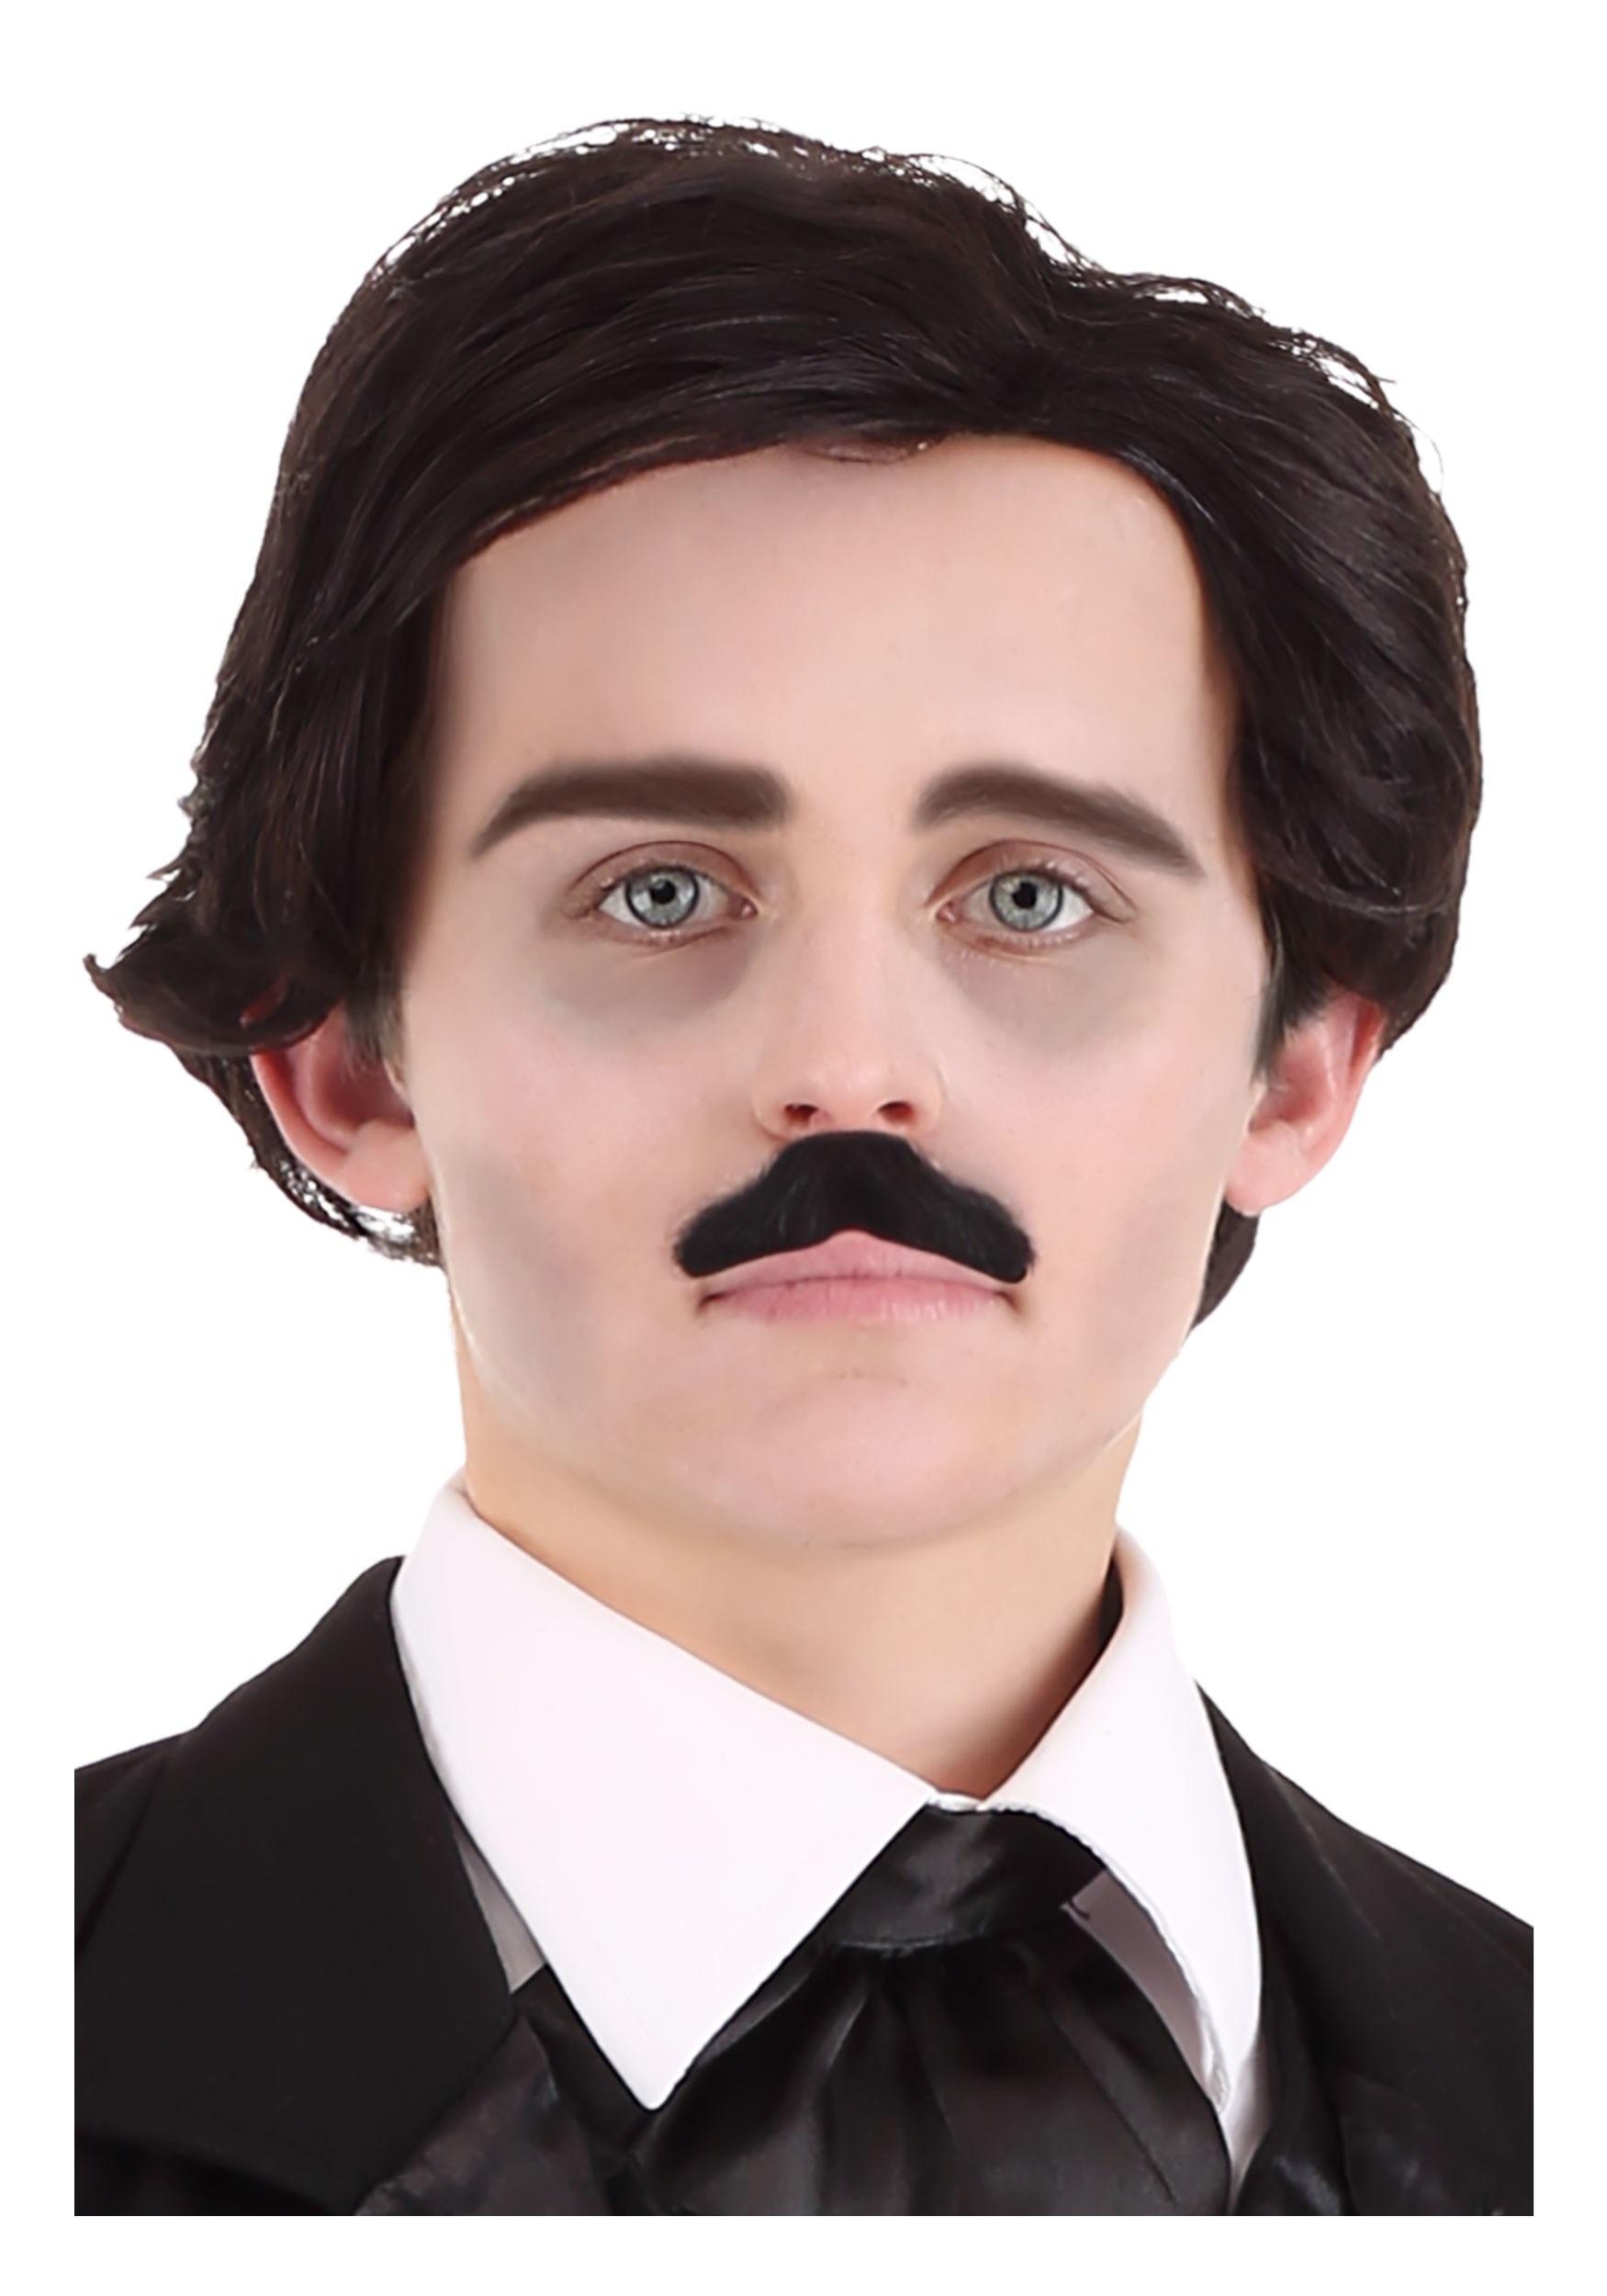 Edgar Allan Poe Wig & Mustache